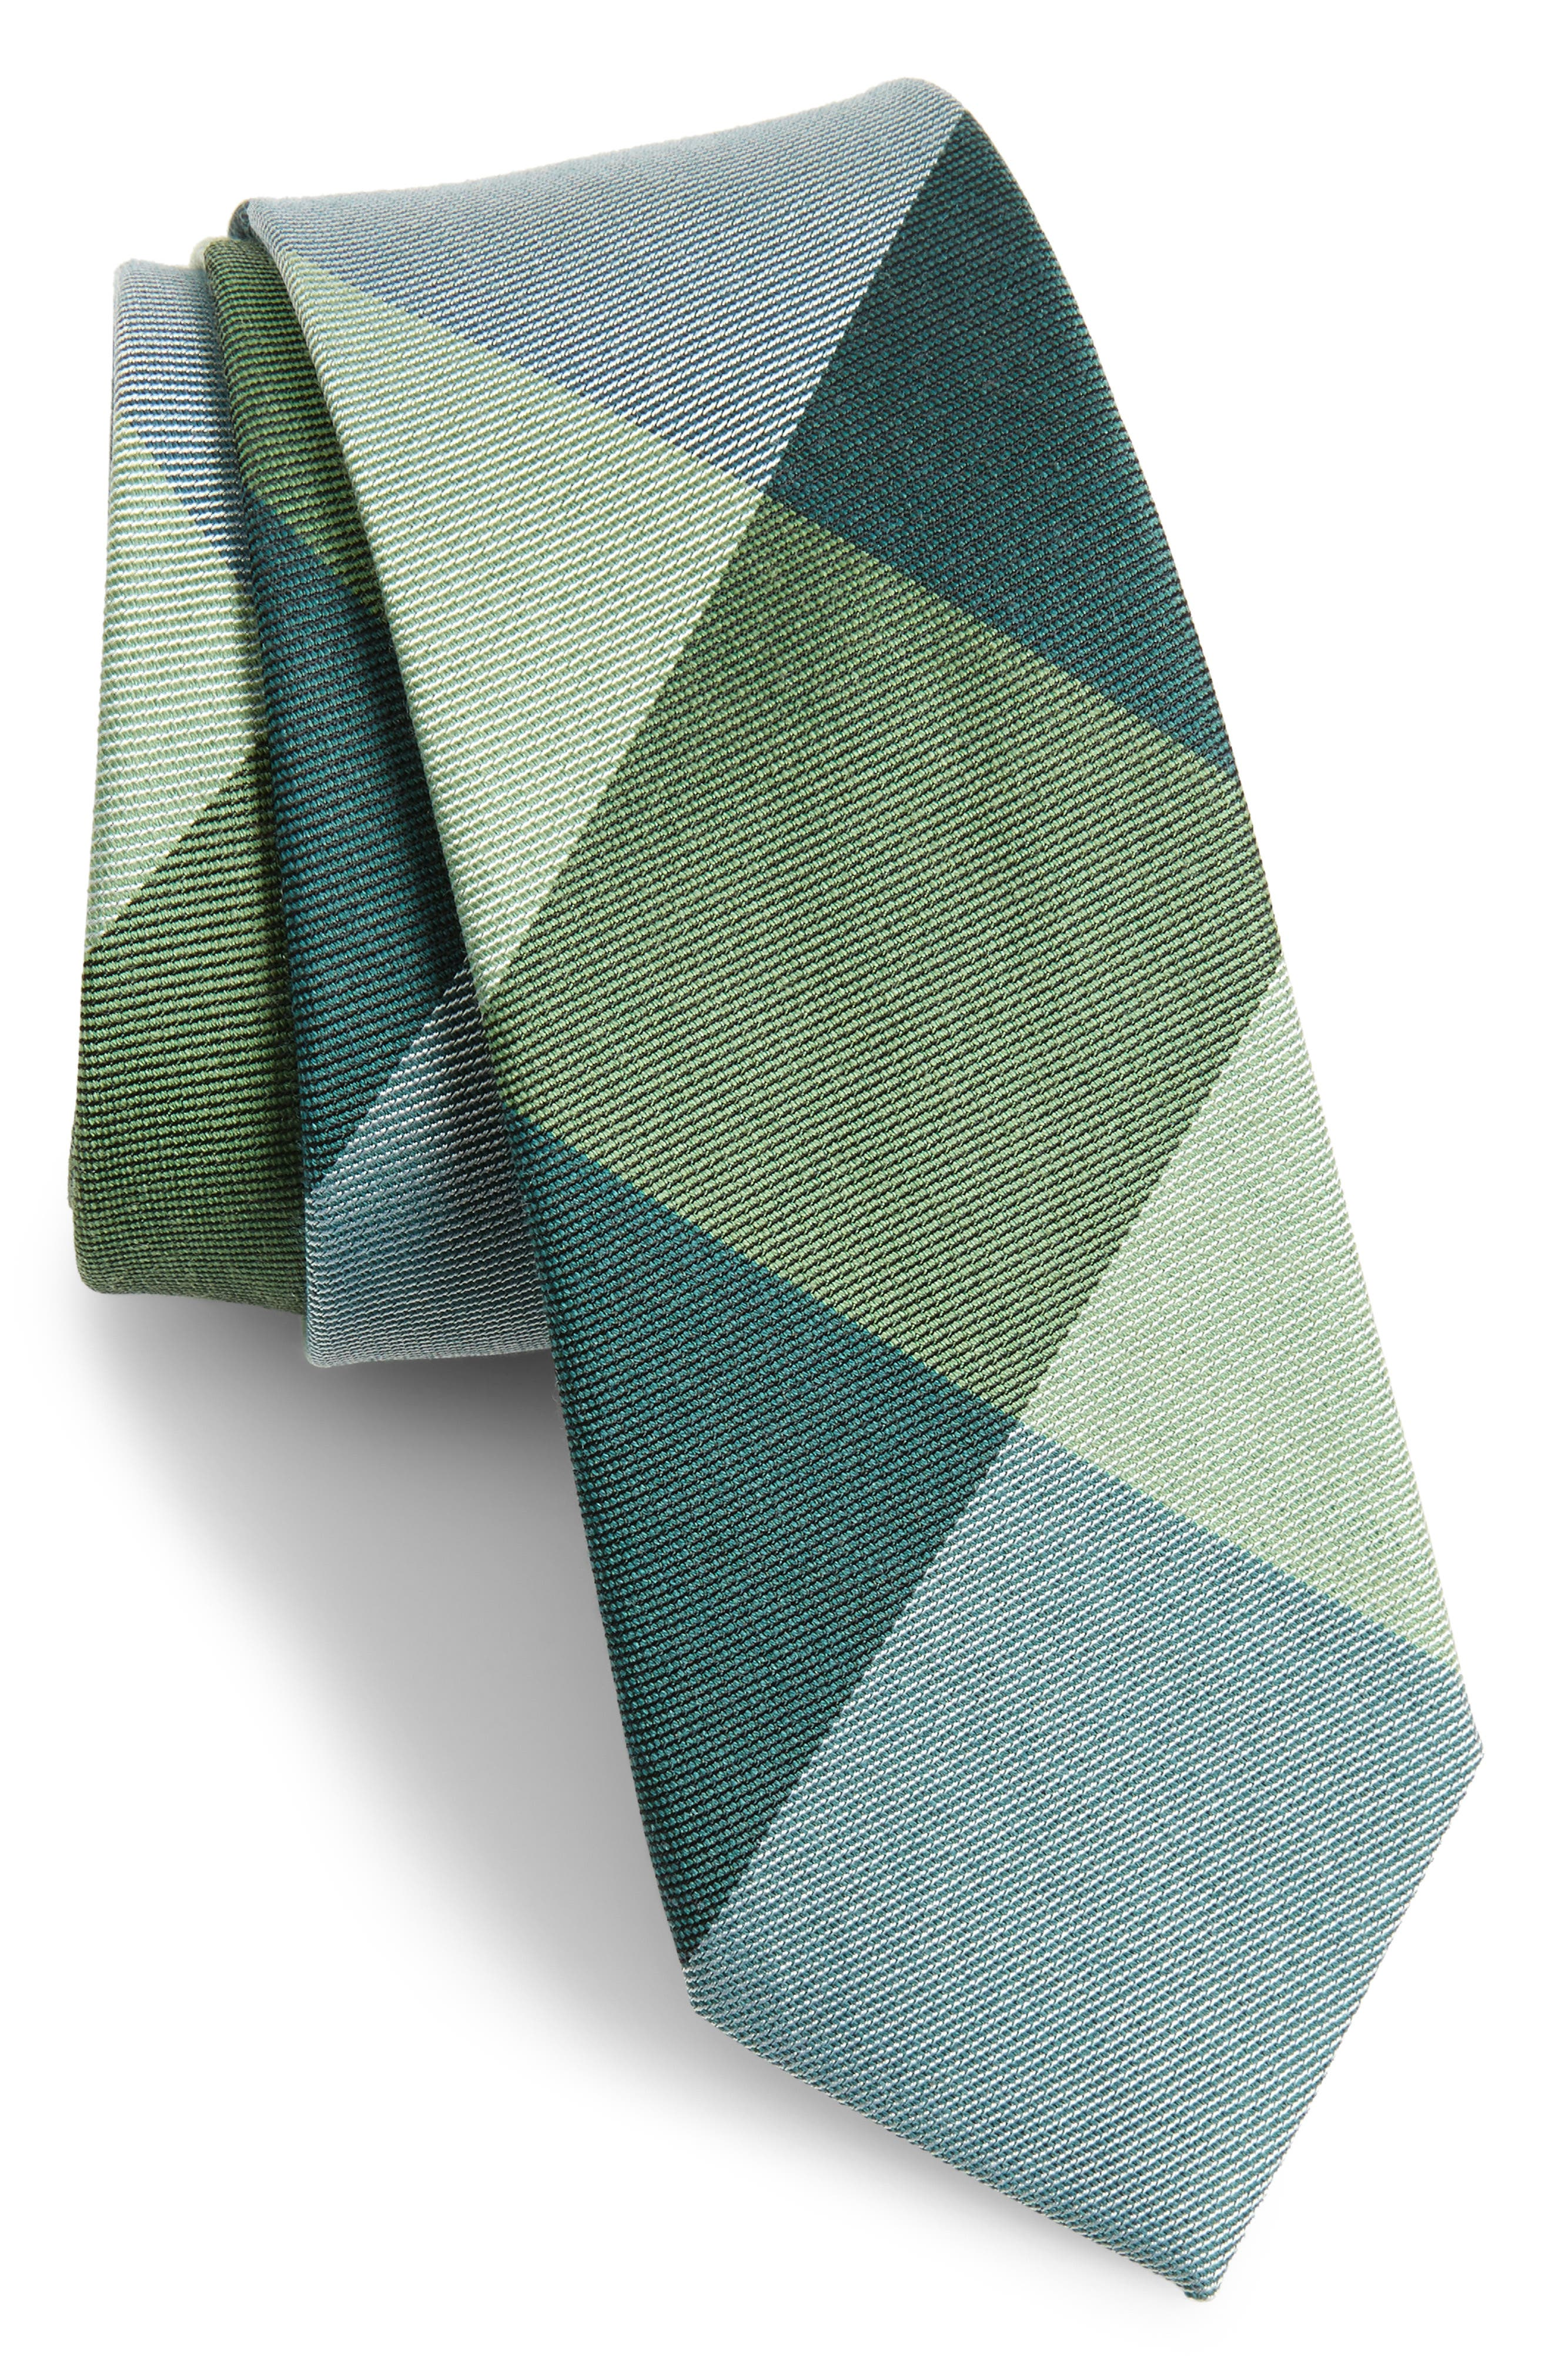 West Bison Plaid Wool & Silk Skinny Tie,                             Main thumbnail 1, color,                             300